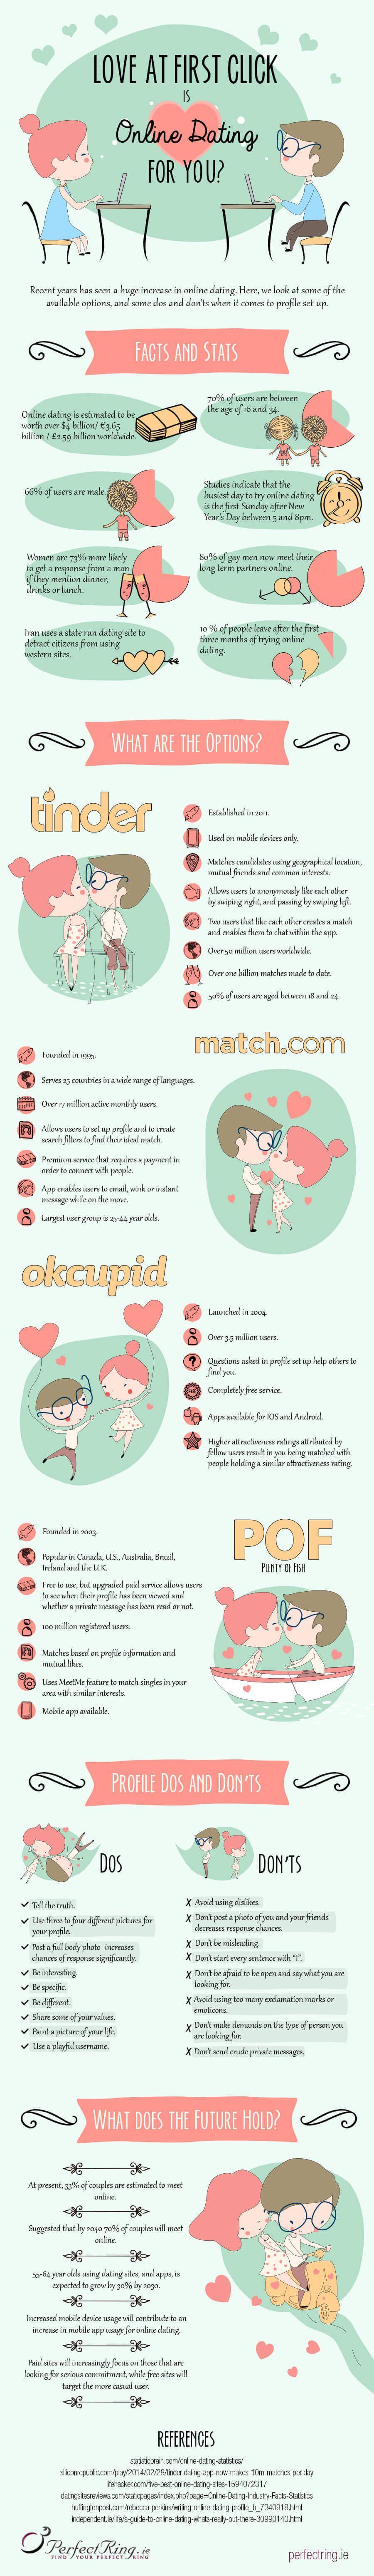 dating design patterns